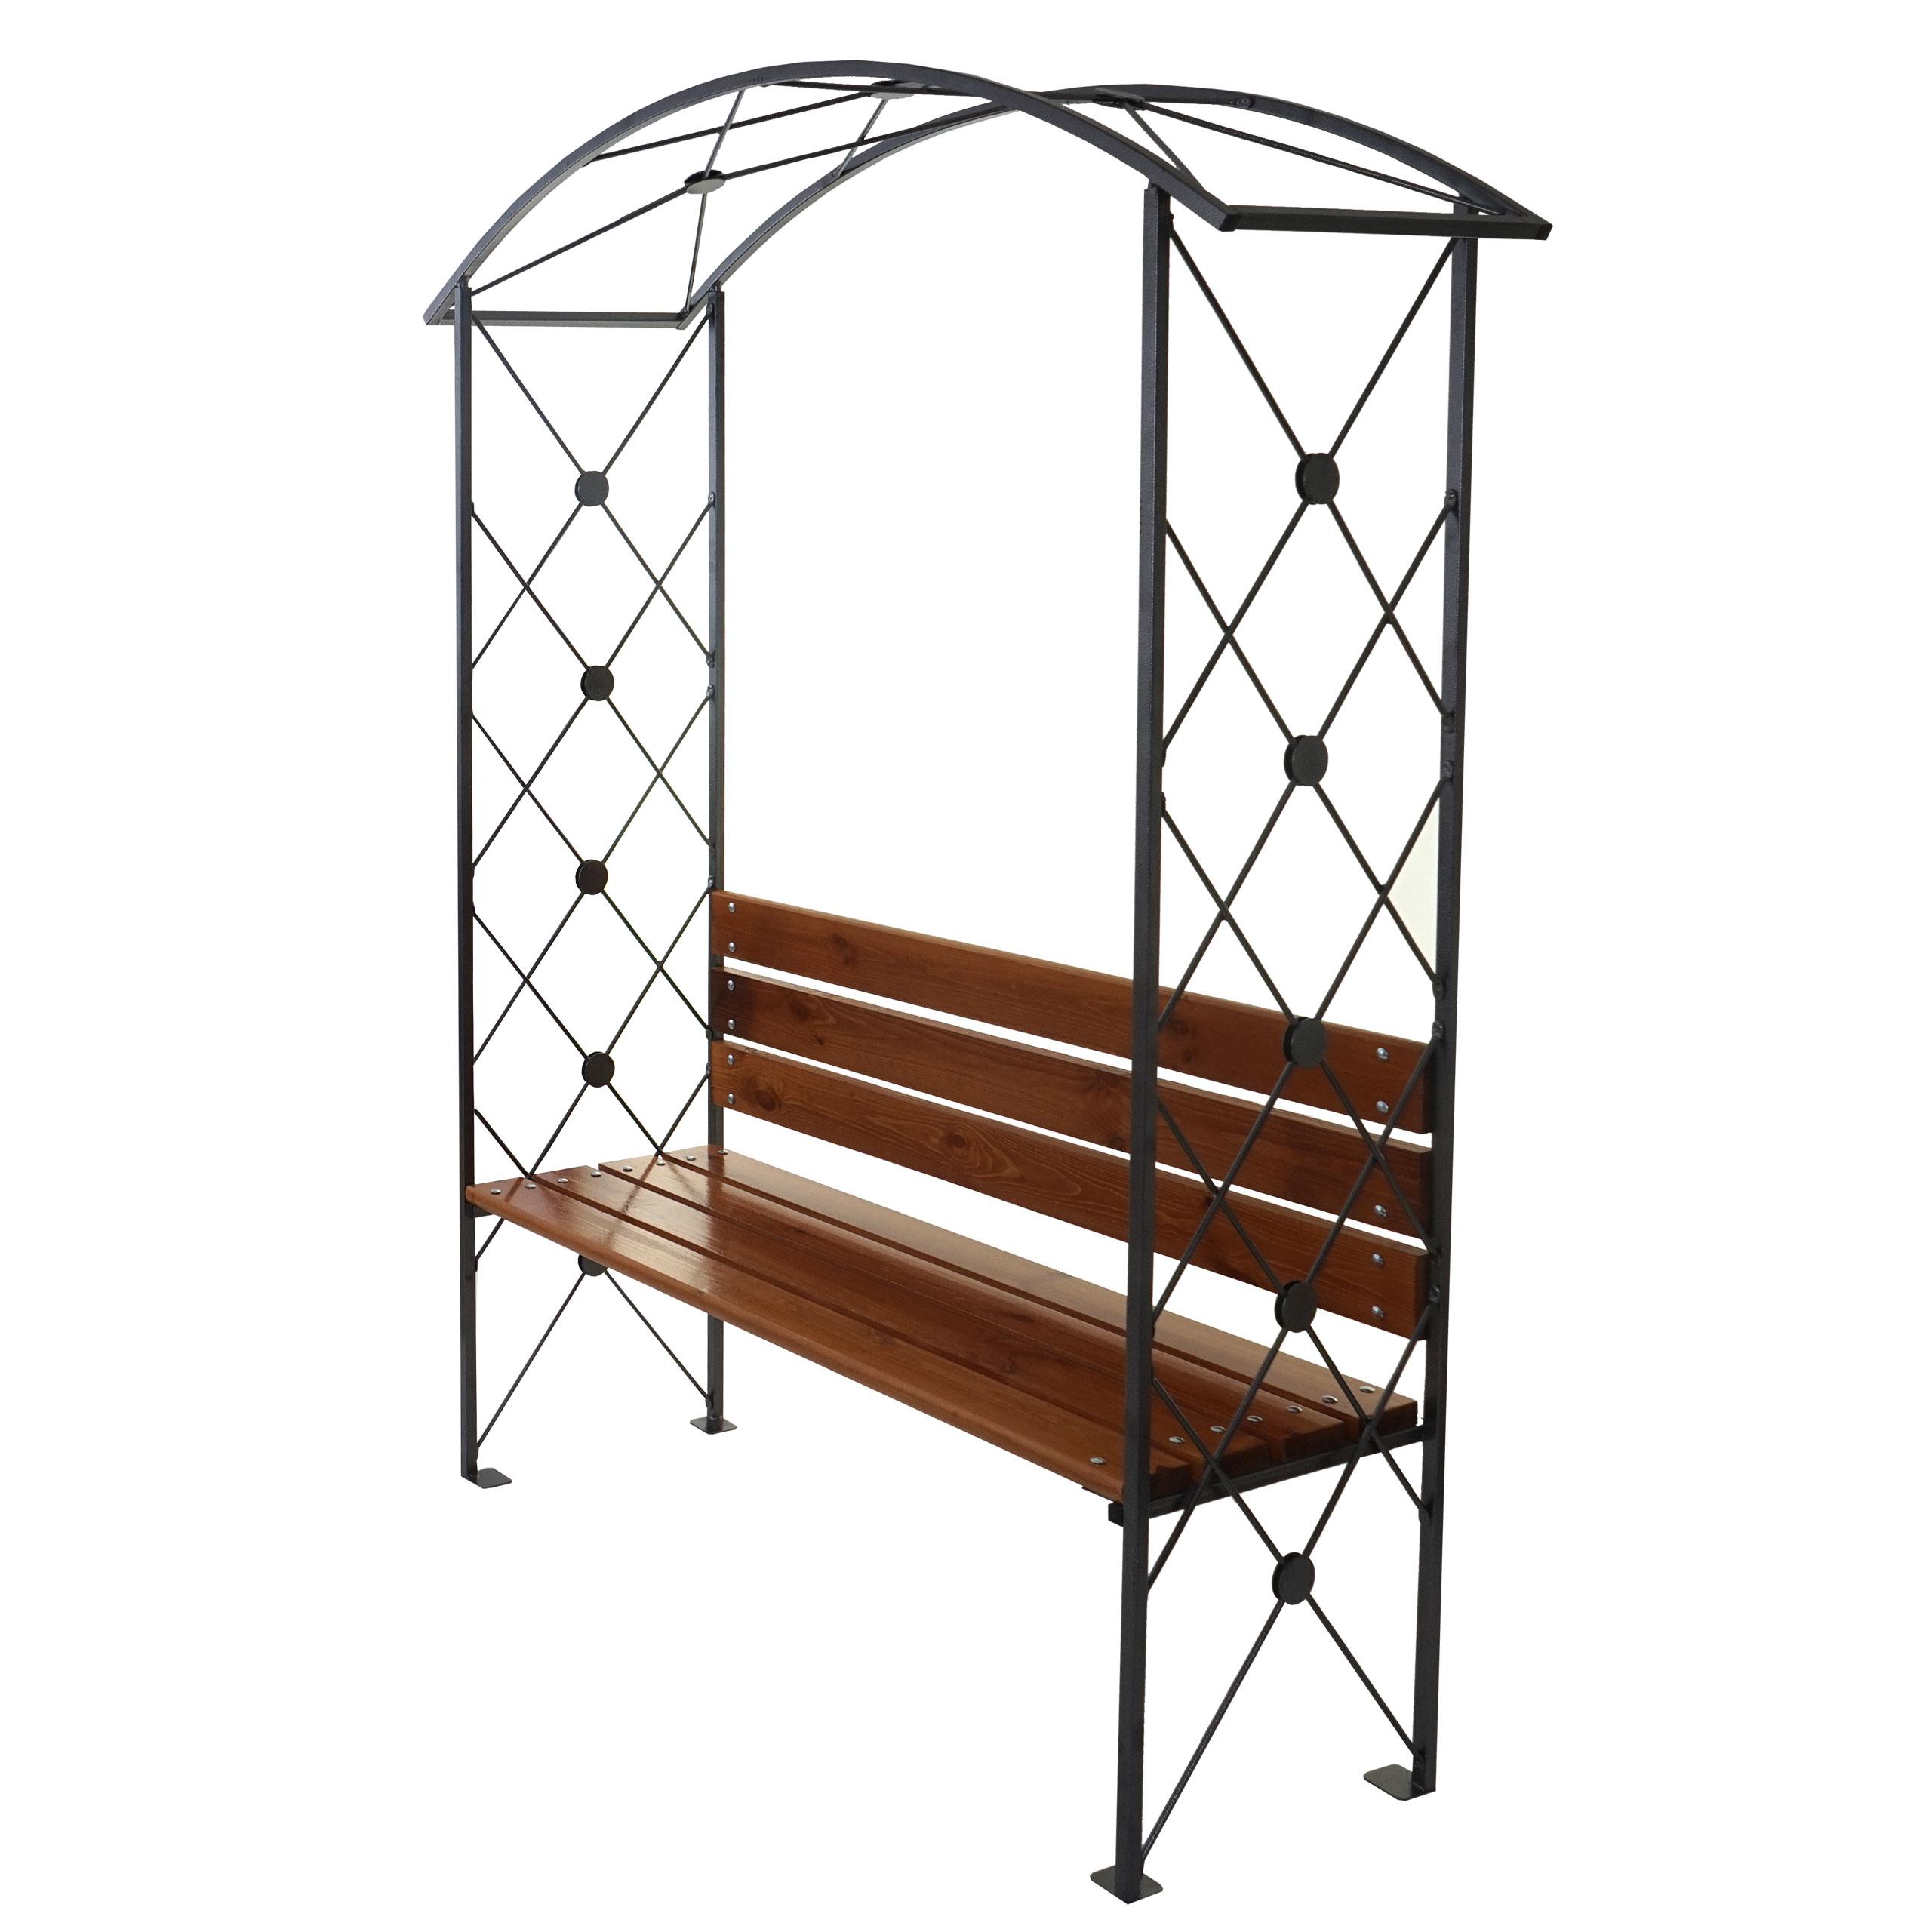 rosenbogen dijon gartenbank rankgitter mit sitzbank holz 210x155x50cm ebay. Black Bedroom Furniture Sets. Home Design Ideas